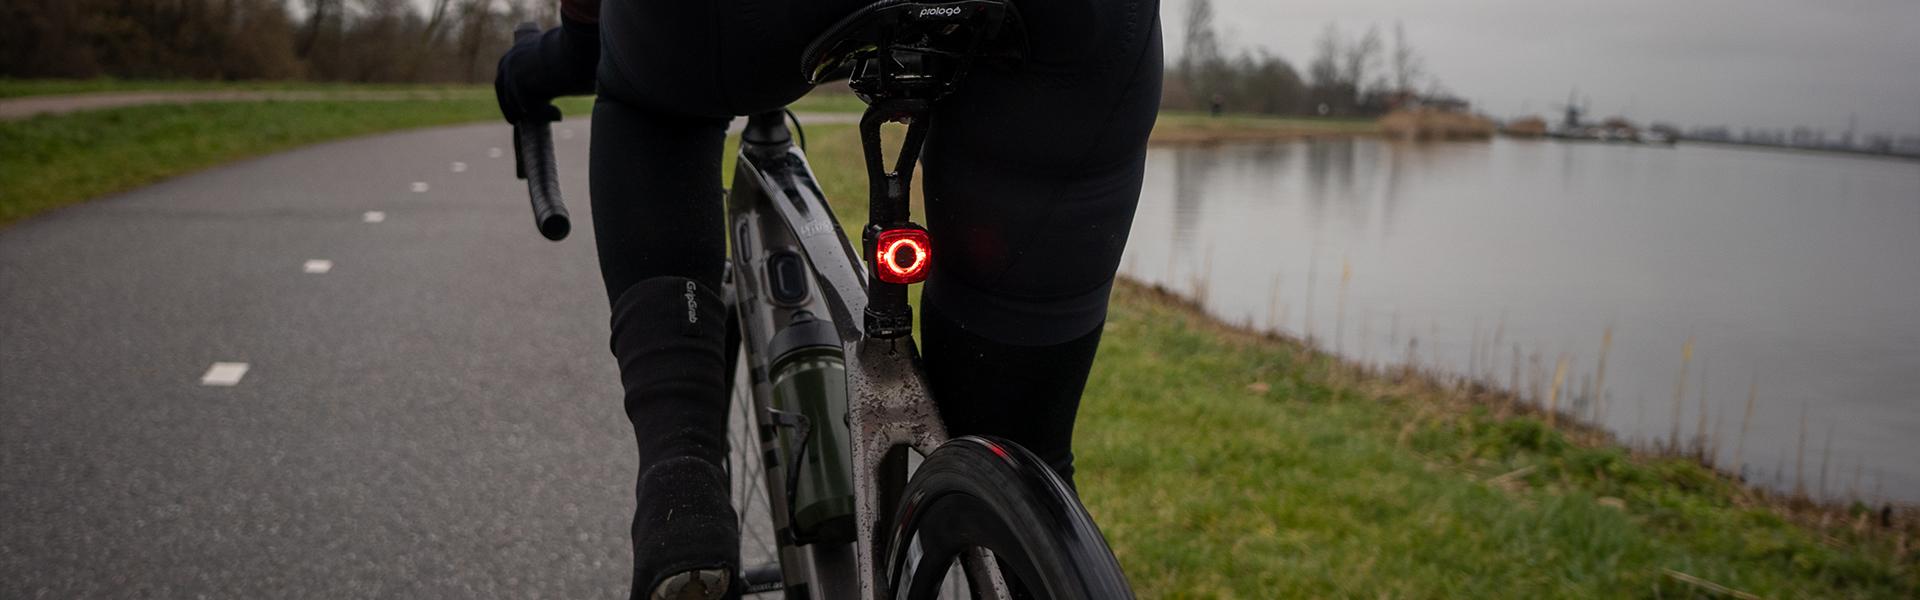 Sate-lite 35 LUX USB rechargeable bike light StVZO eletric bike front light OSRAM LED waterproof